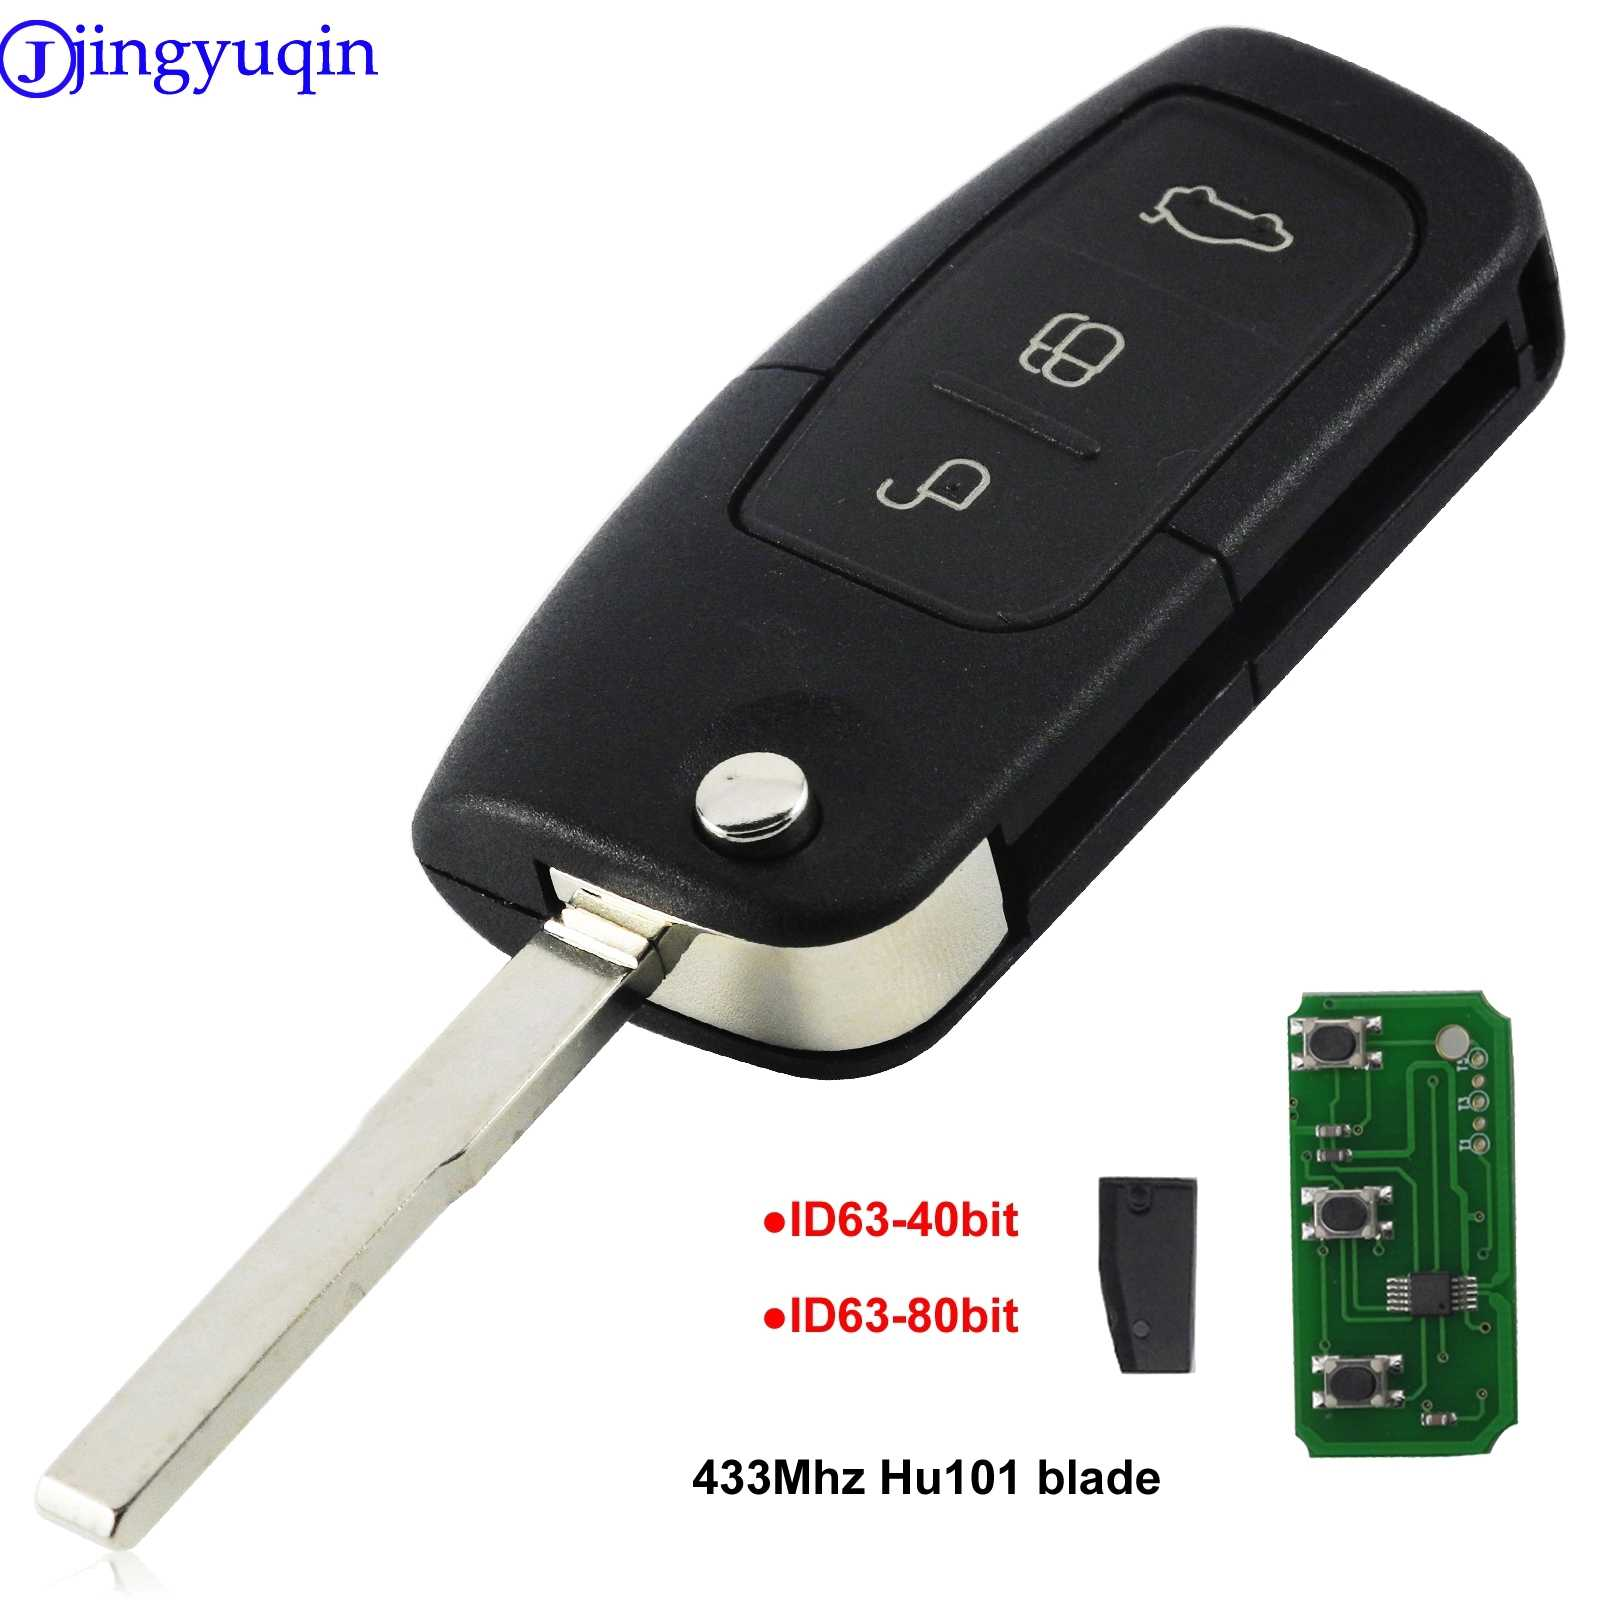 Jingyuqin 433MHz 4D63 40bit 80bit 3 أزرار الوجه للطي مفتاح تحكم عن بعد لفورد فوكس فييستا 2013 حافظة فوب HU101 شفرة